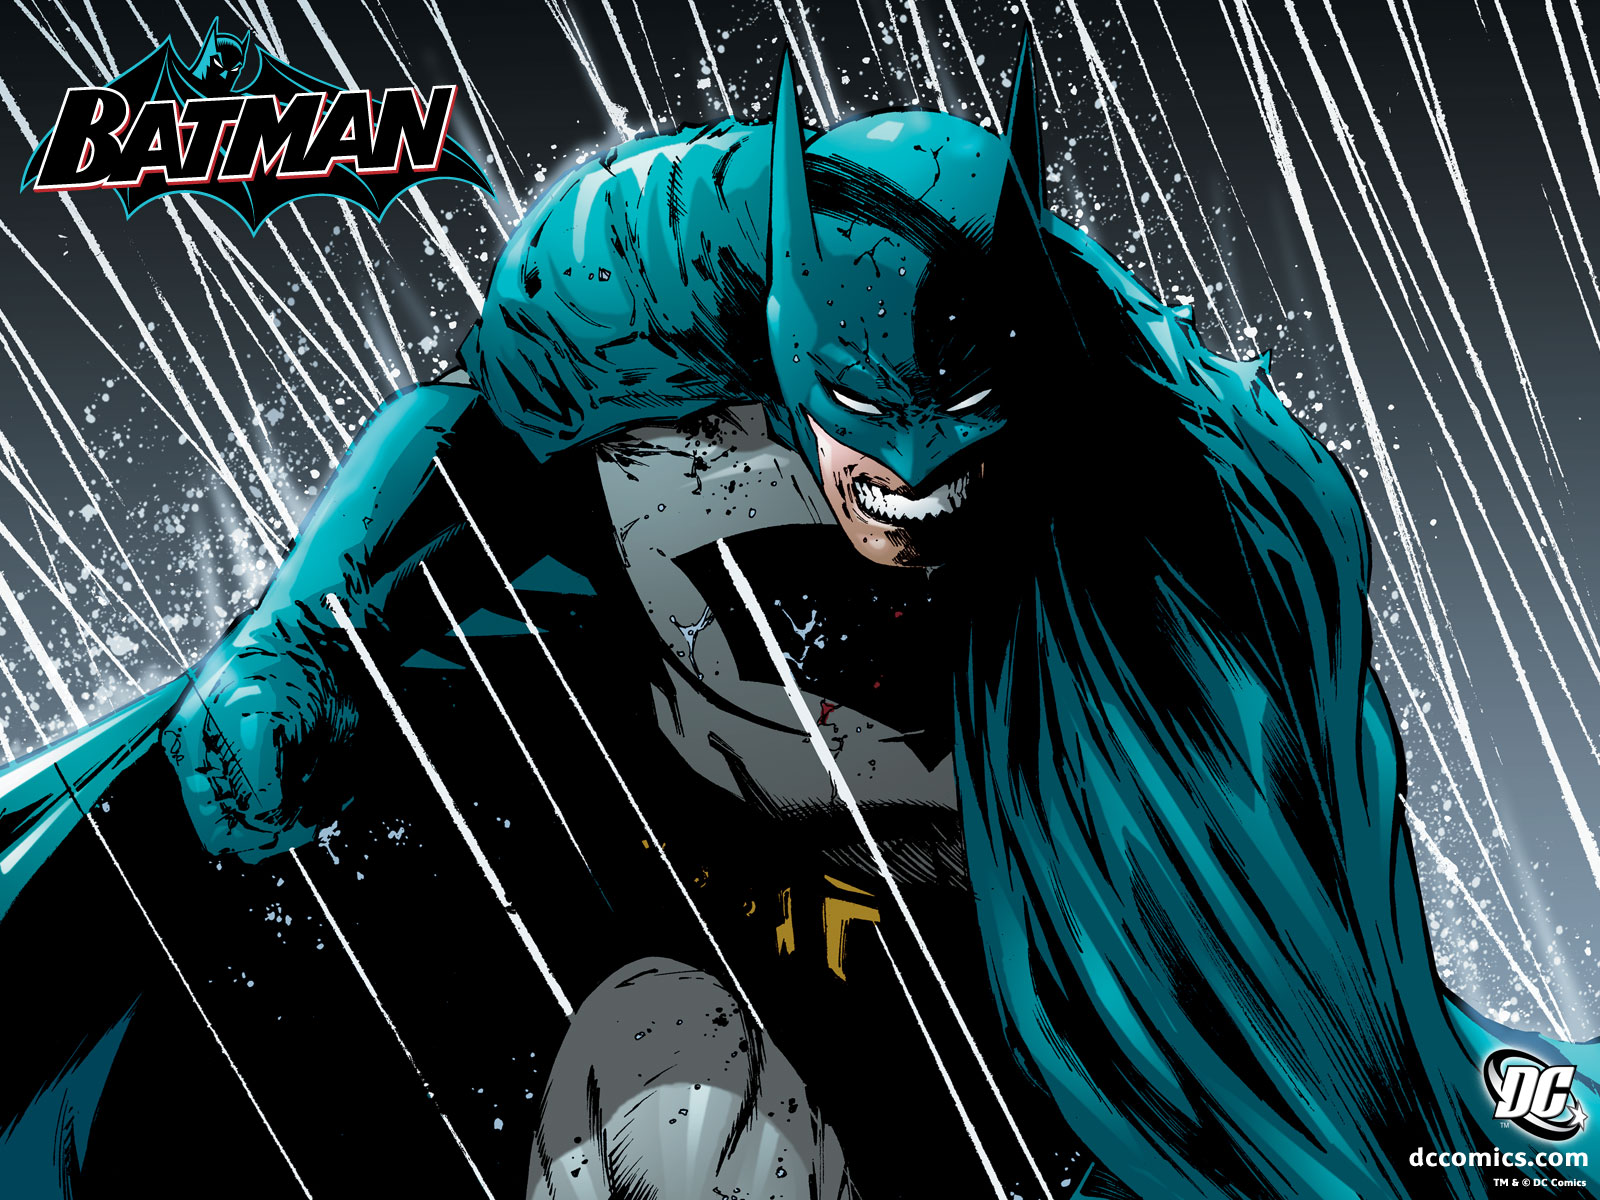 Batman vai além das HQs e causa polêmica no mundo real ... Batman Comic Cover Wallpaper